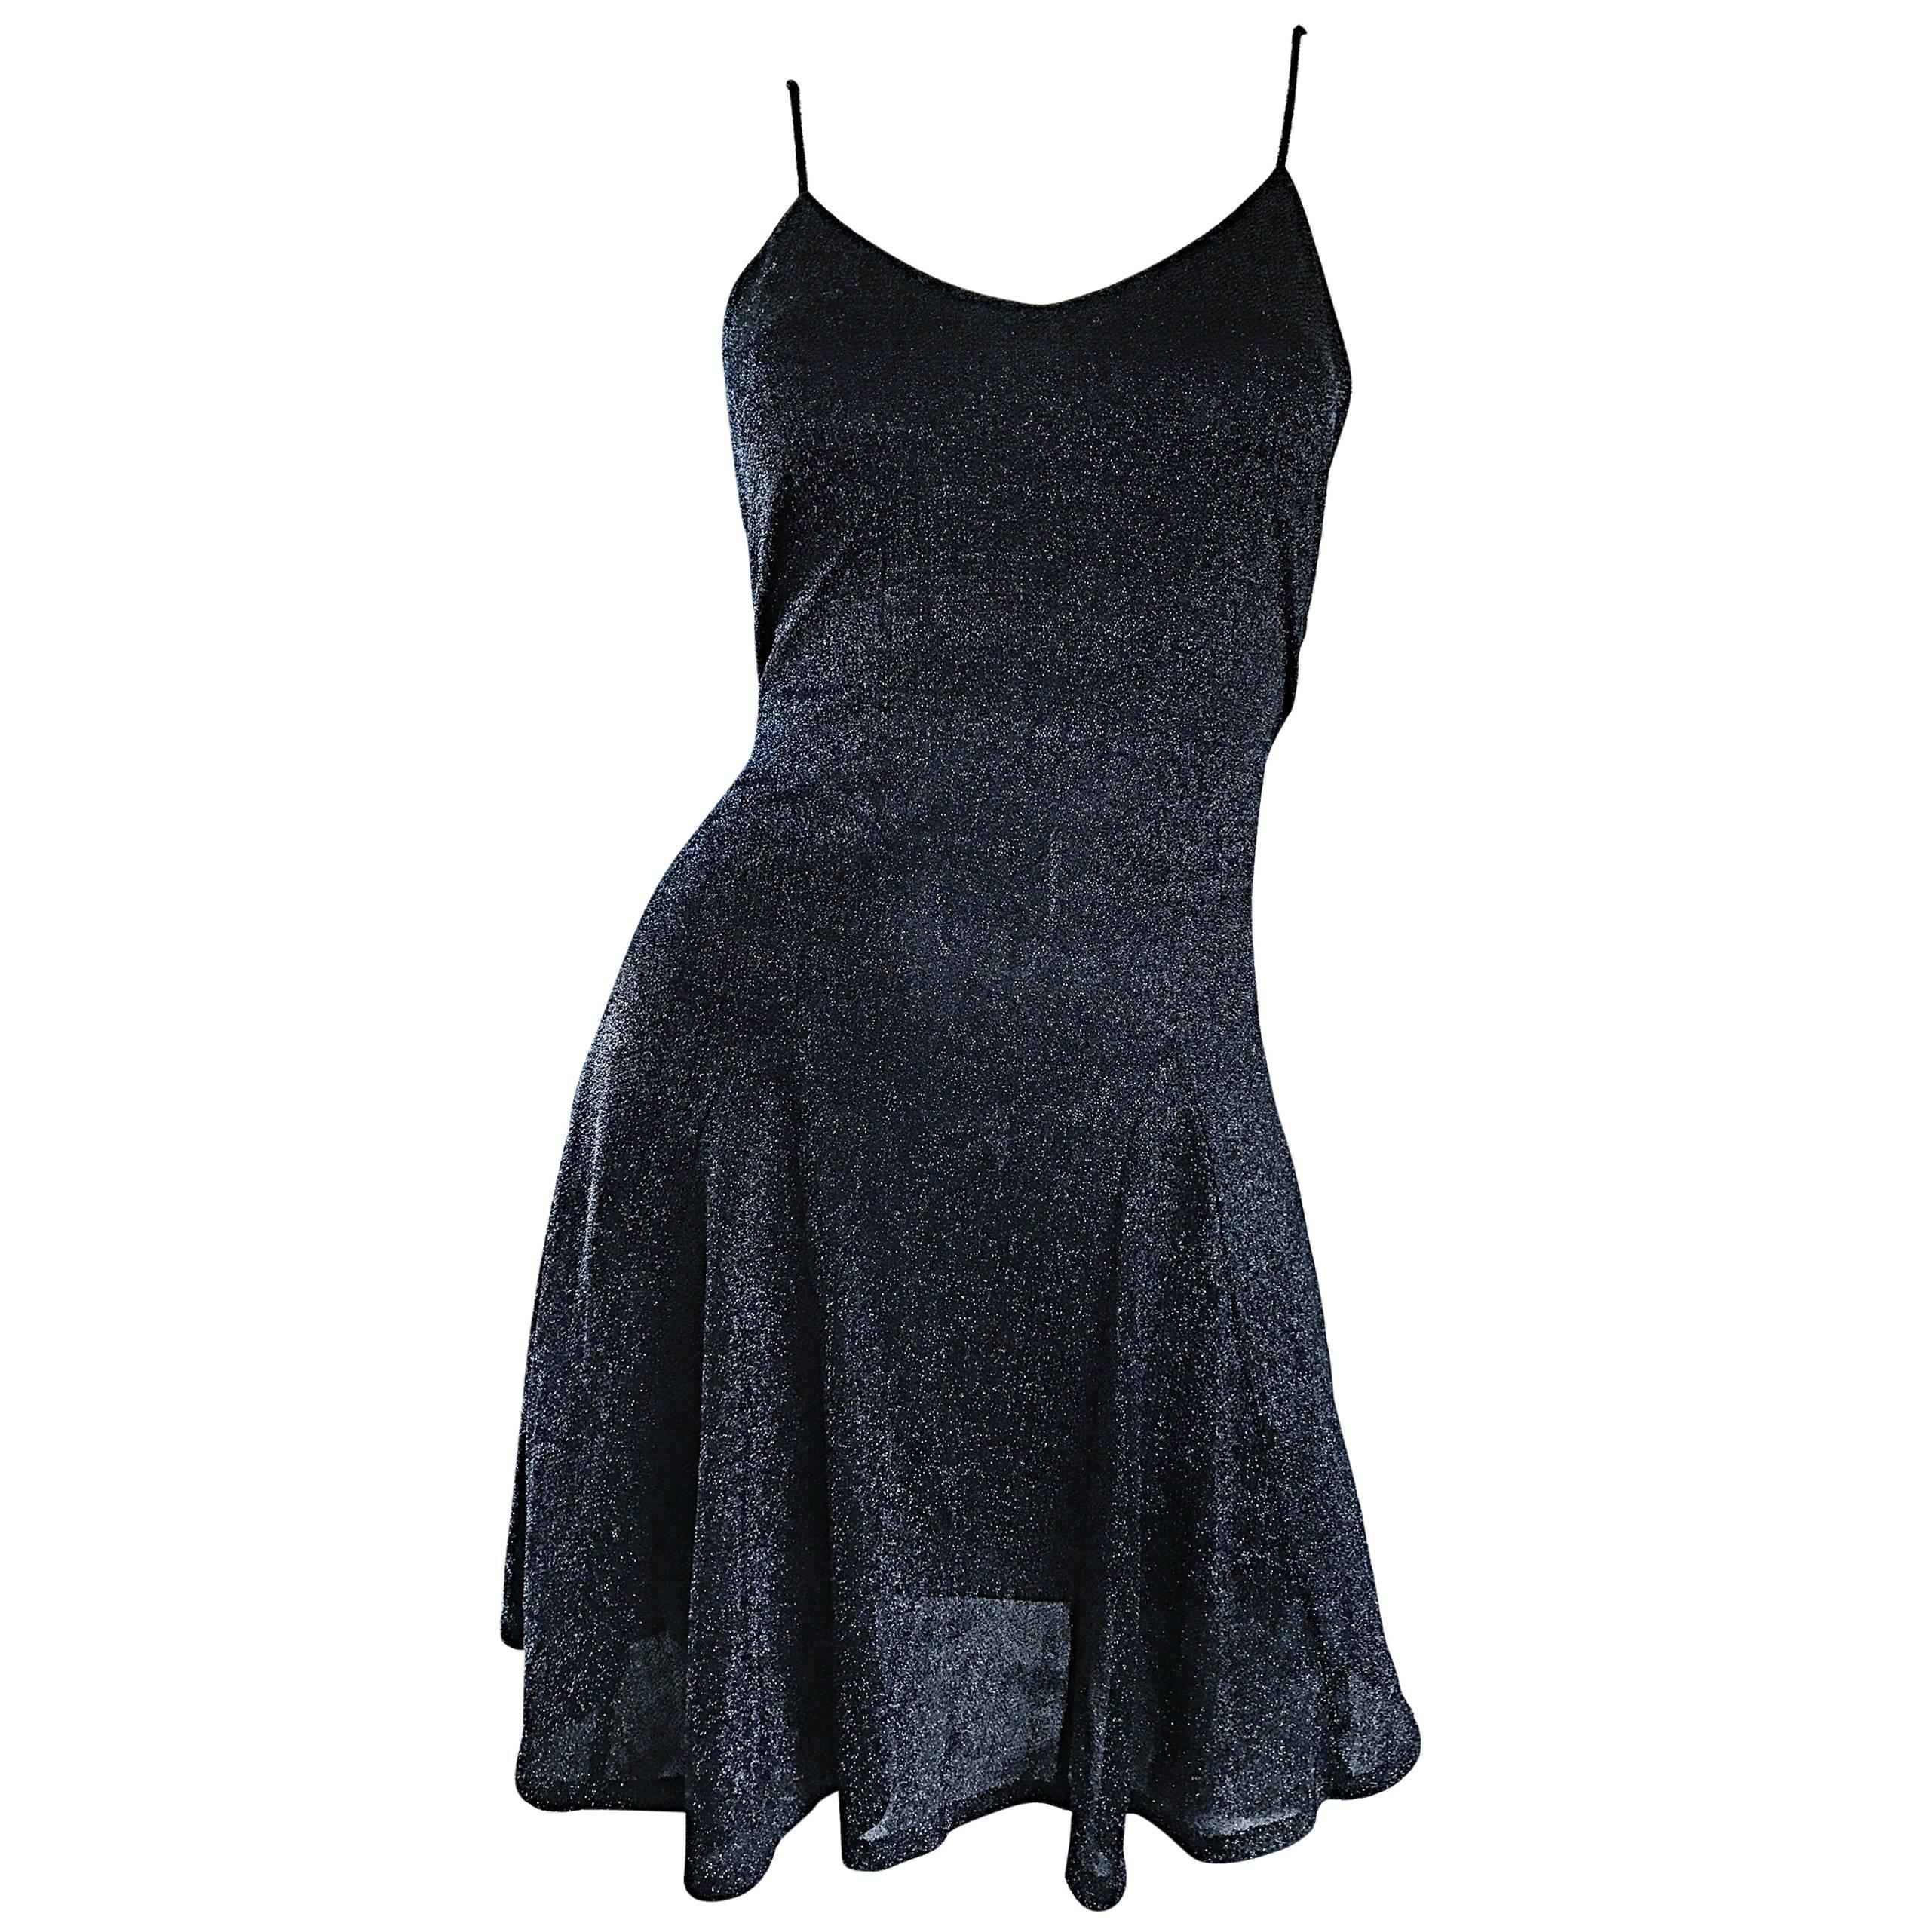 1990s Betsey Johnson Black Metallic Lurex Vintage 90s Mini Skater Dress Petite